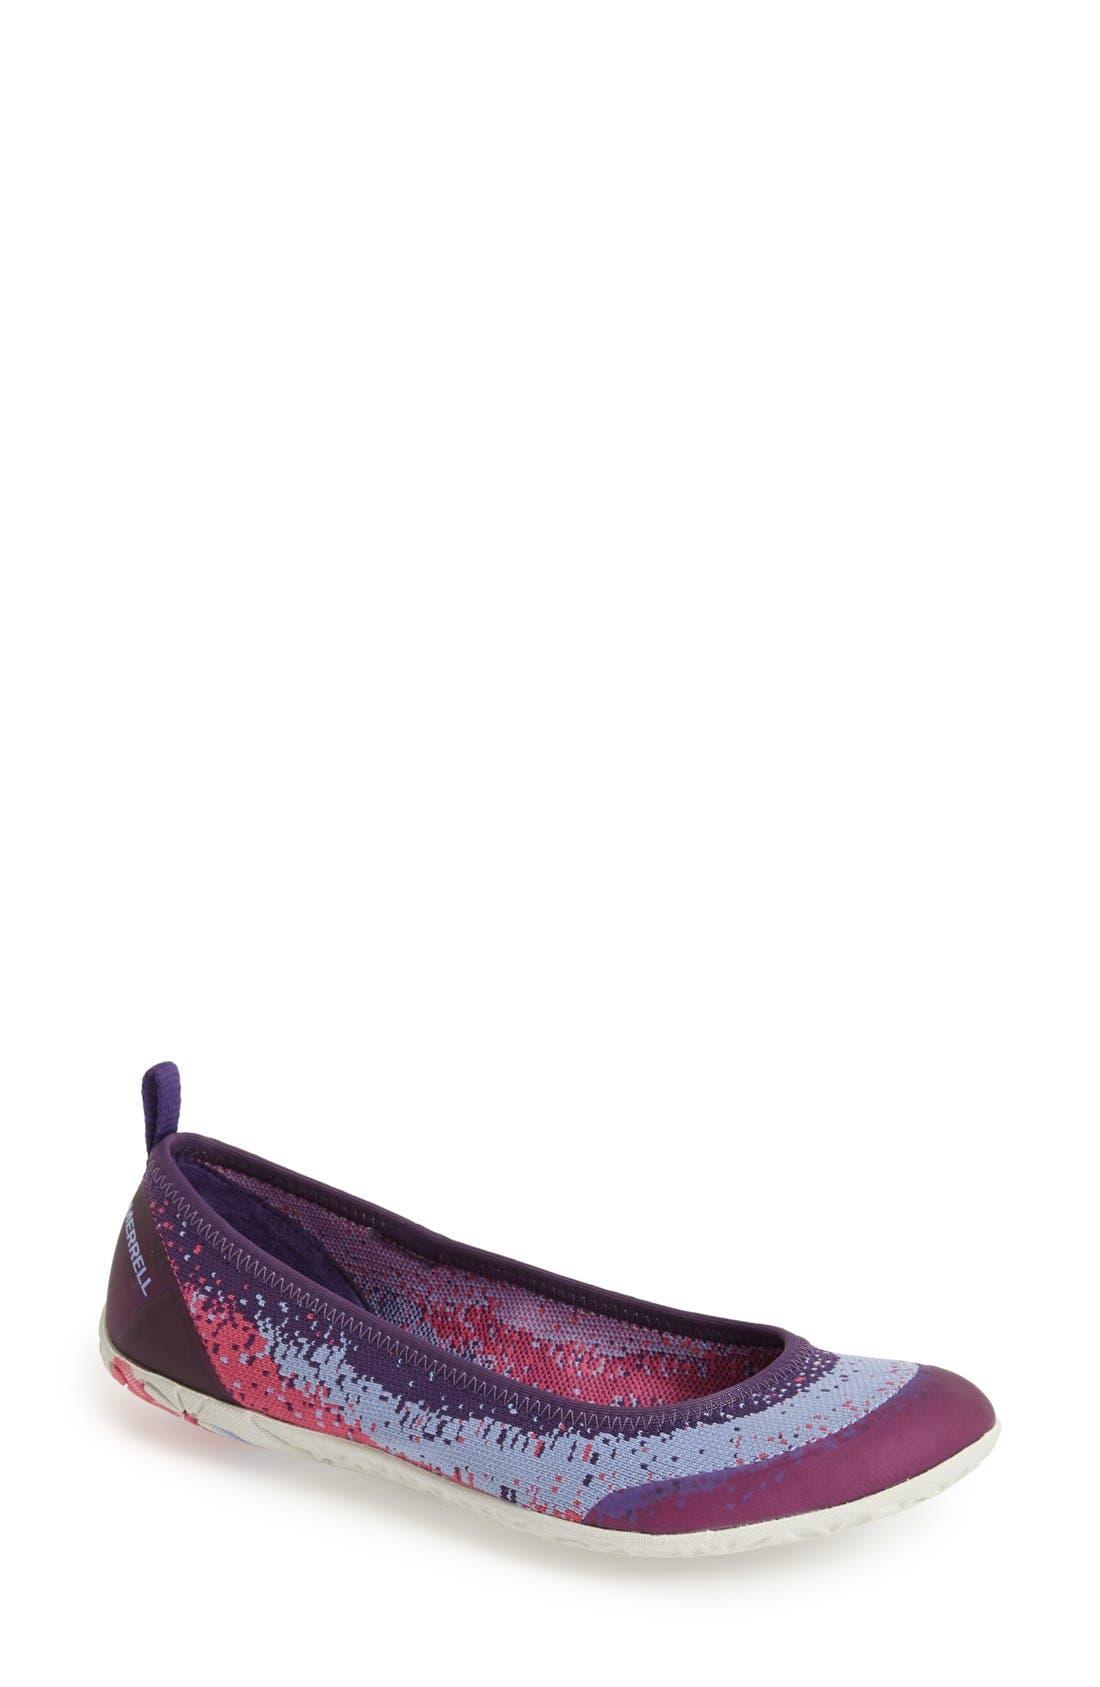 Main Image - Merrell 'Mimix Meld' Sneaker (Women)